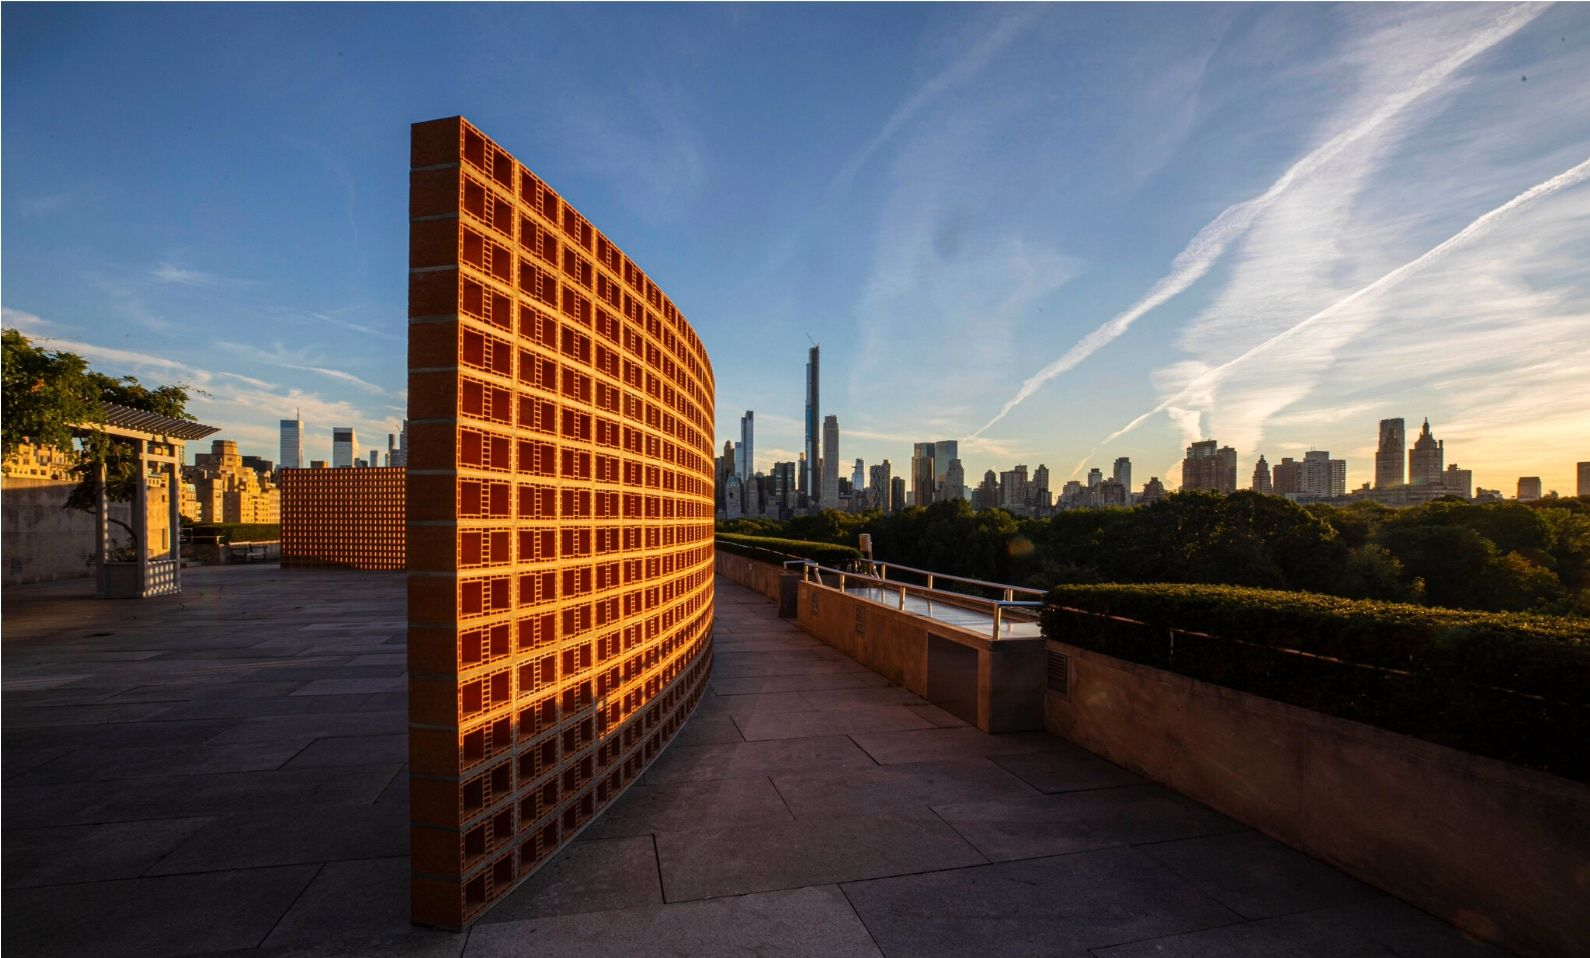 Hector Zamora, Lattice Detour | The Met Roof Garden Commission